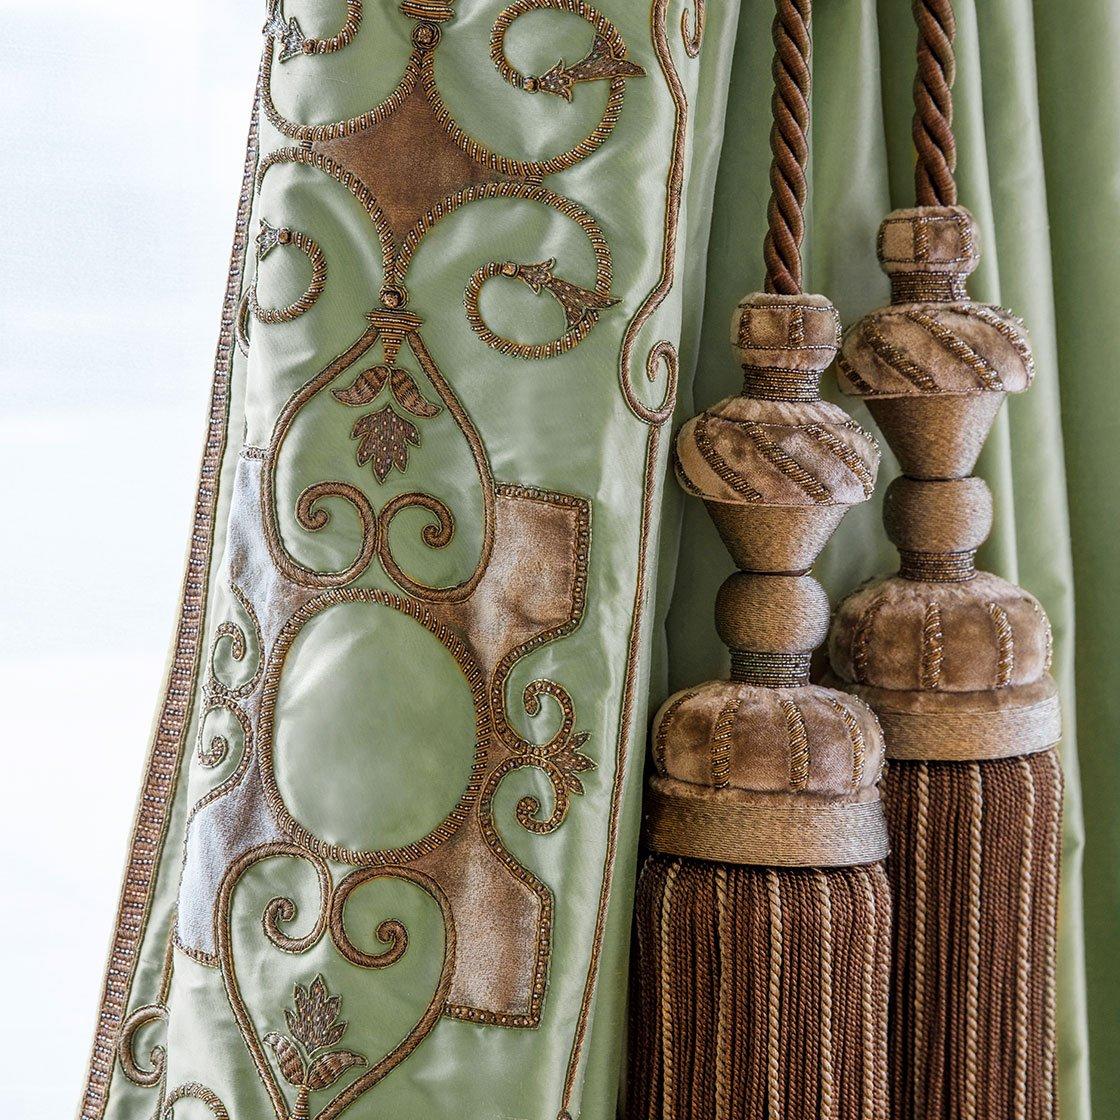 Cordoba - On Imperial Teffeta Eau De Nil And Imogen Tie Backs - Beaumont & Fletcher - Beaumont & Fletcher